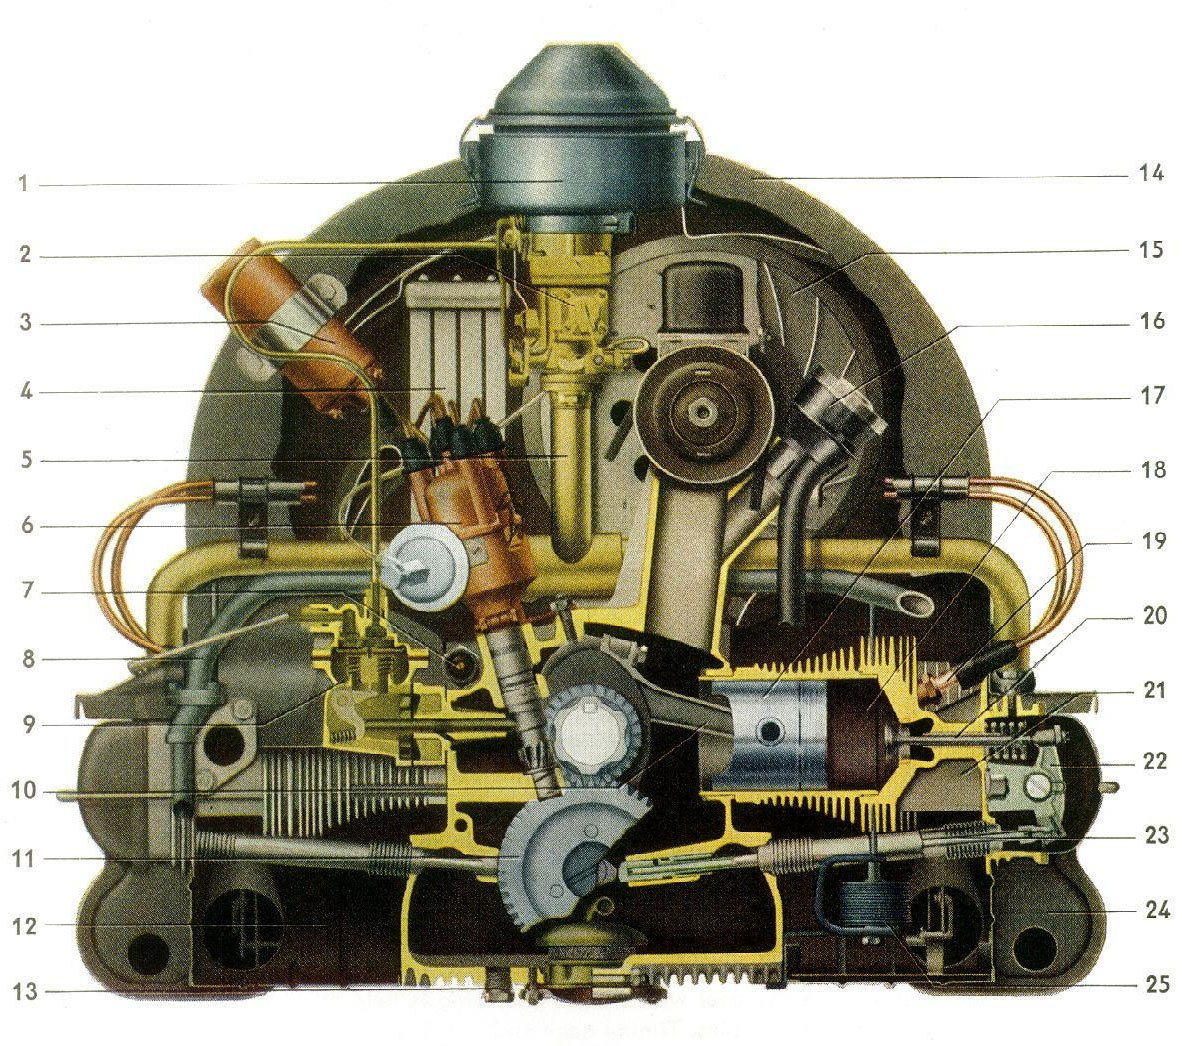 AL_8515] Vw Beetle Engine Tin Diagram On 1600 Volkswagen Engine Diagram  Wiring DiagramIcand Ixtu Phae Mohammedshrine Librar Wiring 101